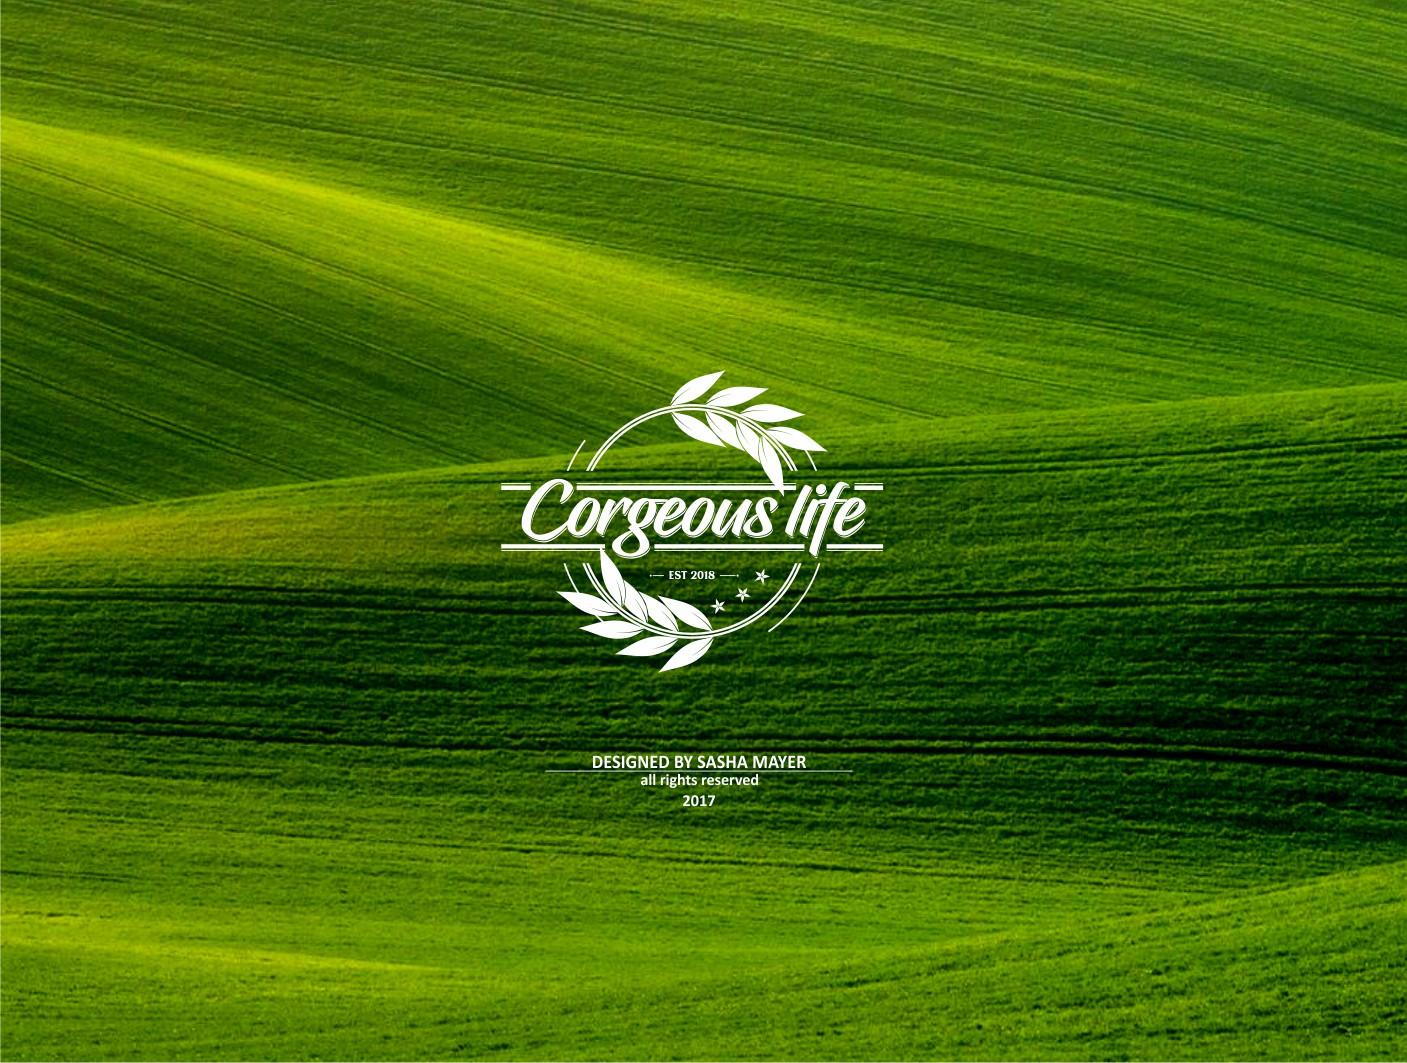 corgeous life